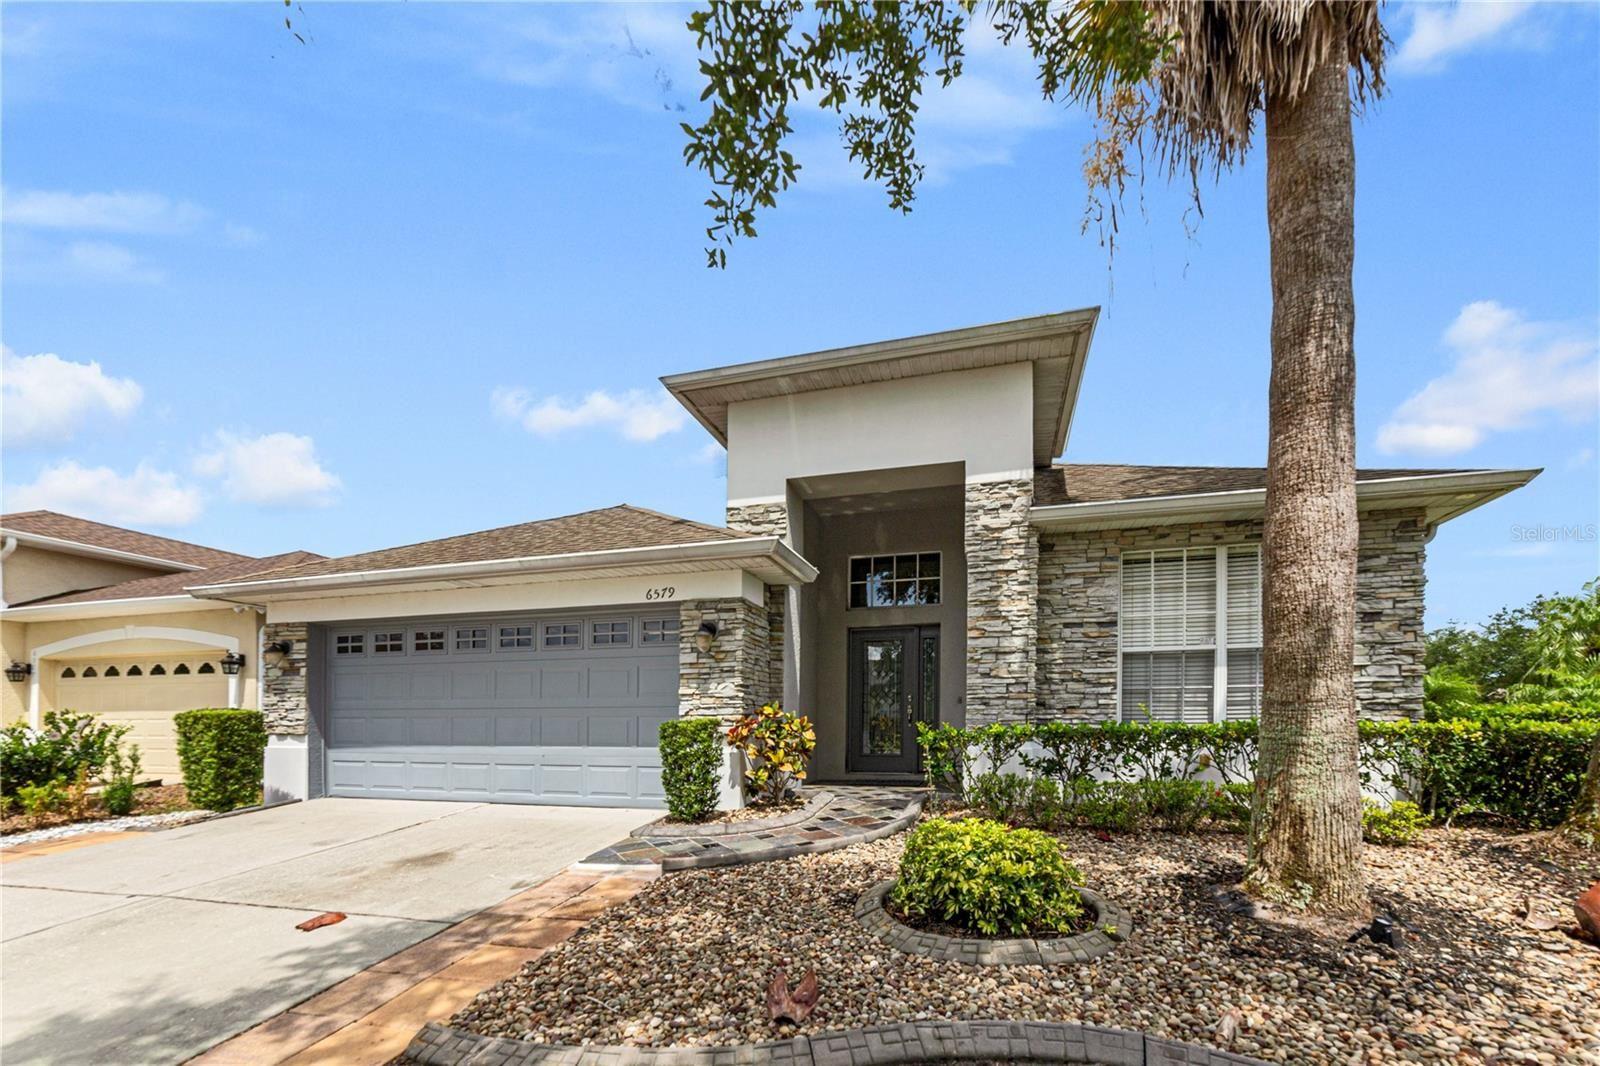 6579 LAKE CARLISLE BOULEVARD, Orlando, FL 32829 - MLS#: O5950076